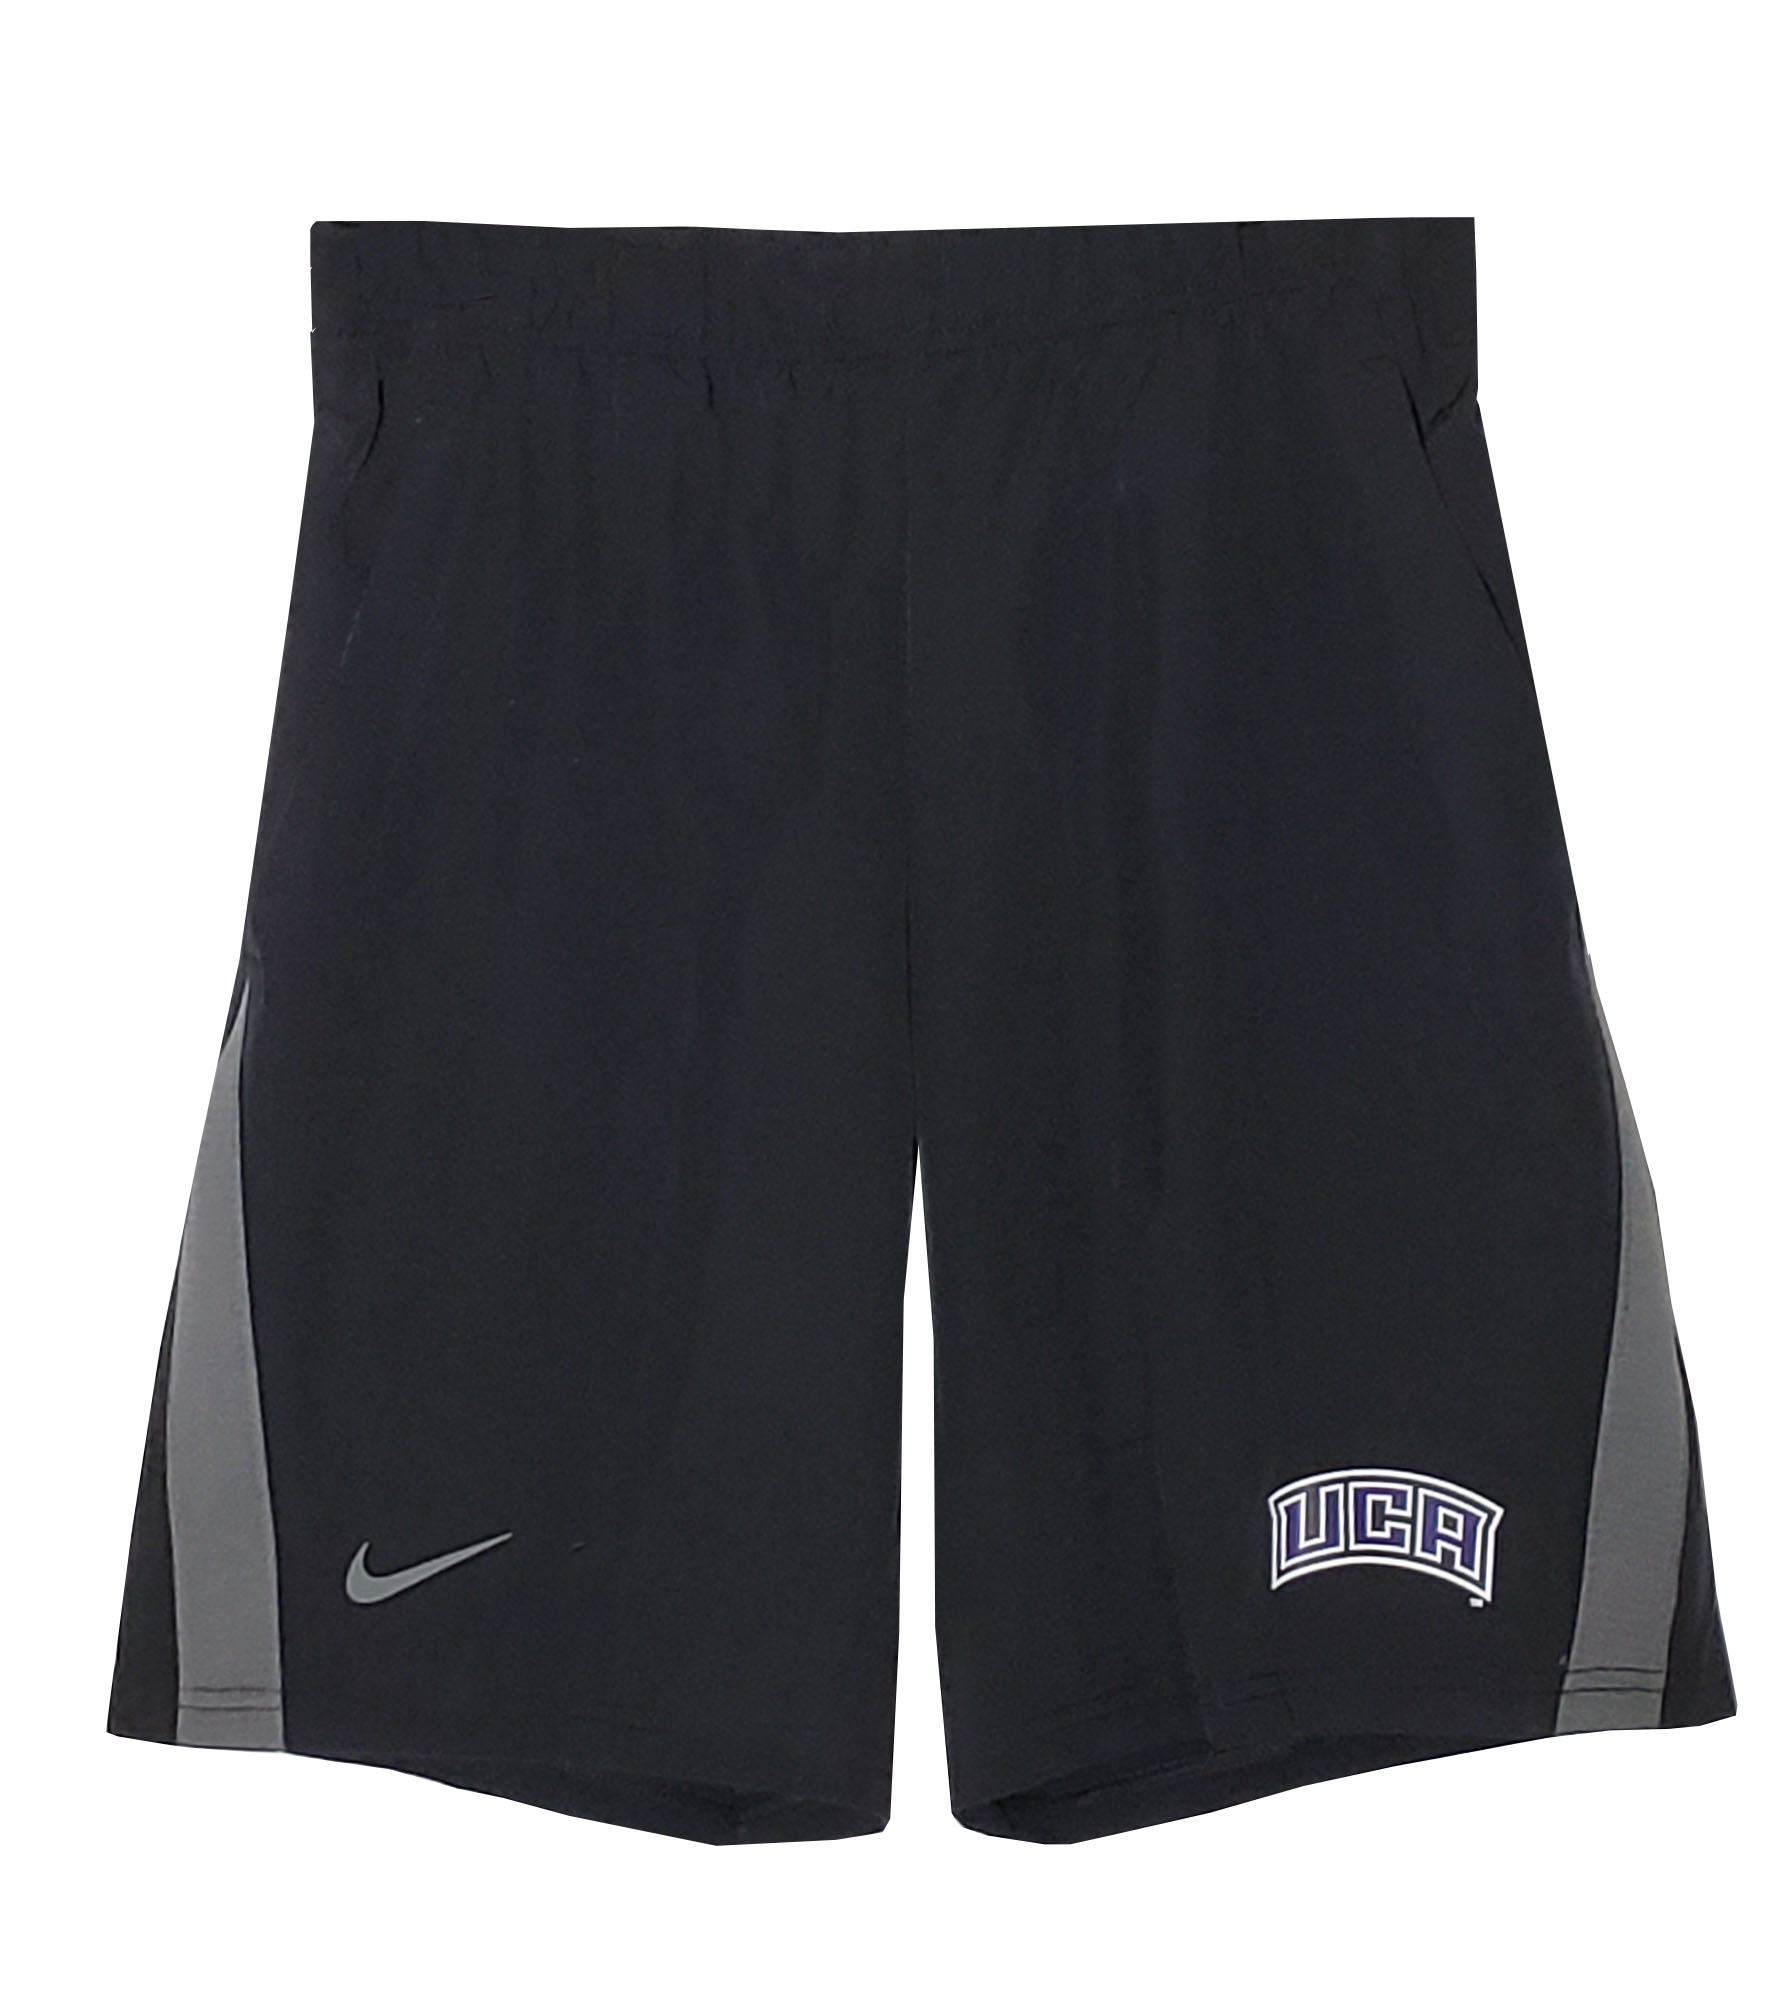 Flex 2.0 Shorts